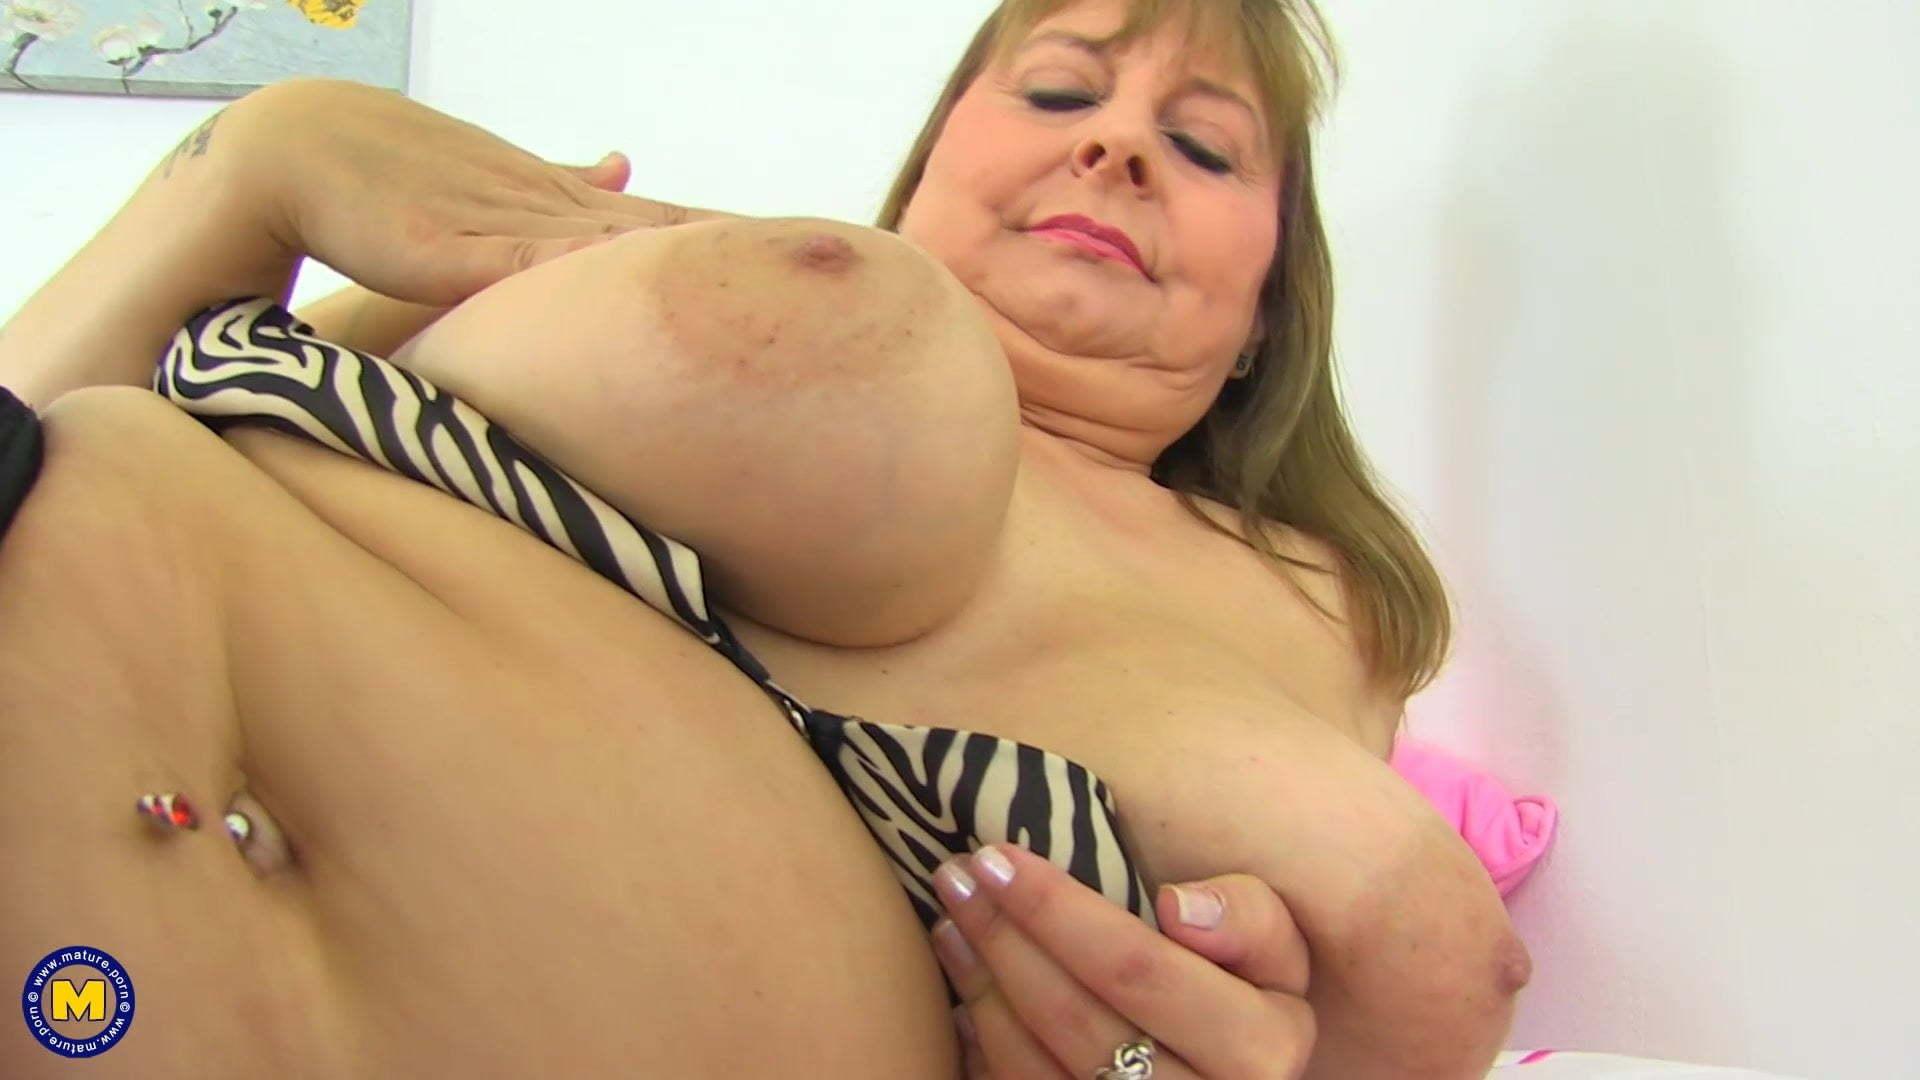 Alexa Mature Breast Porn mature busty natural mother alexa from uk